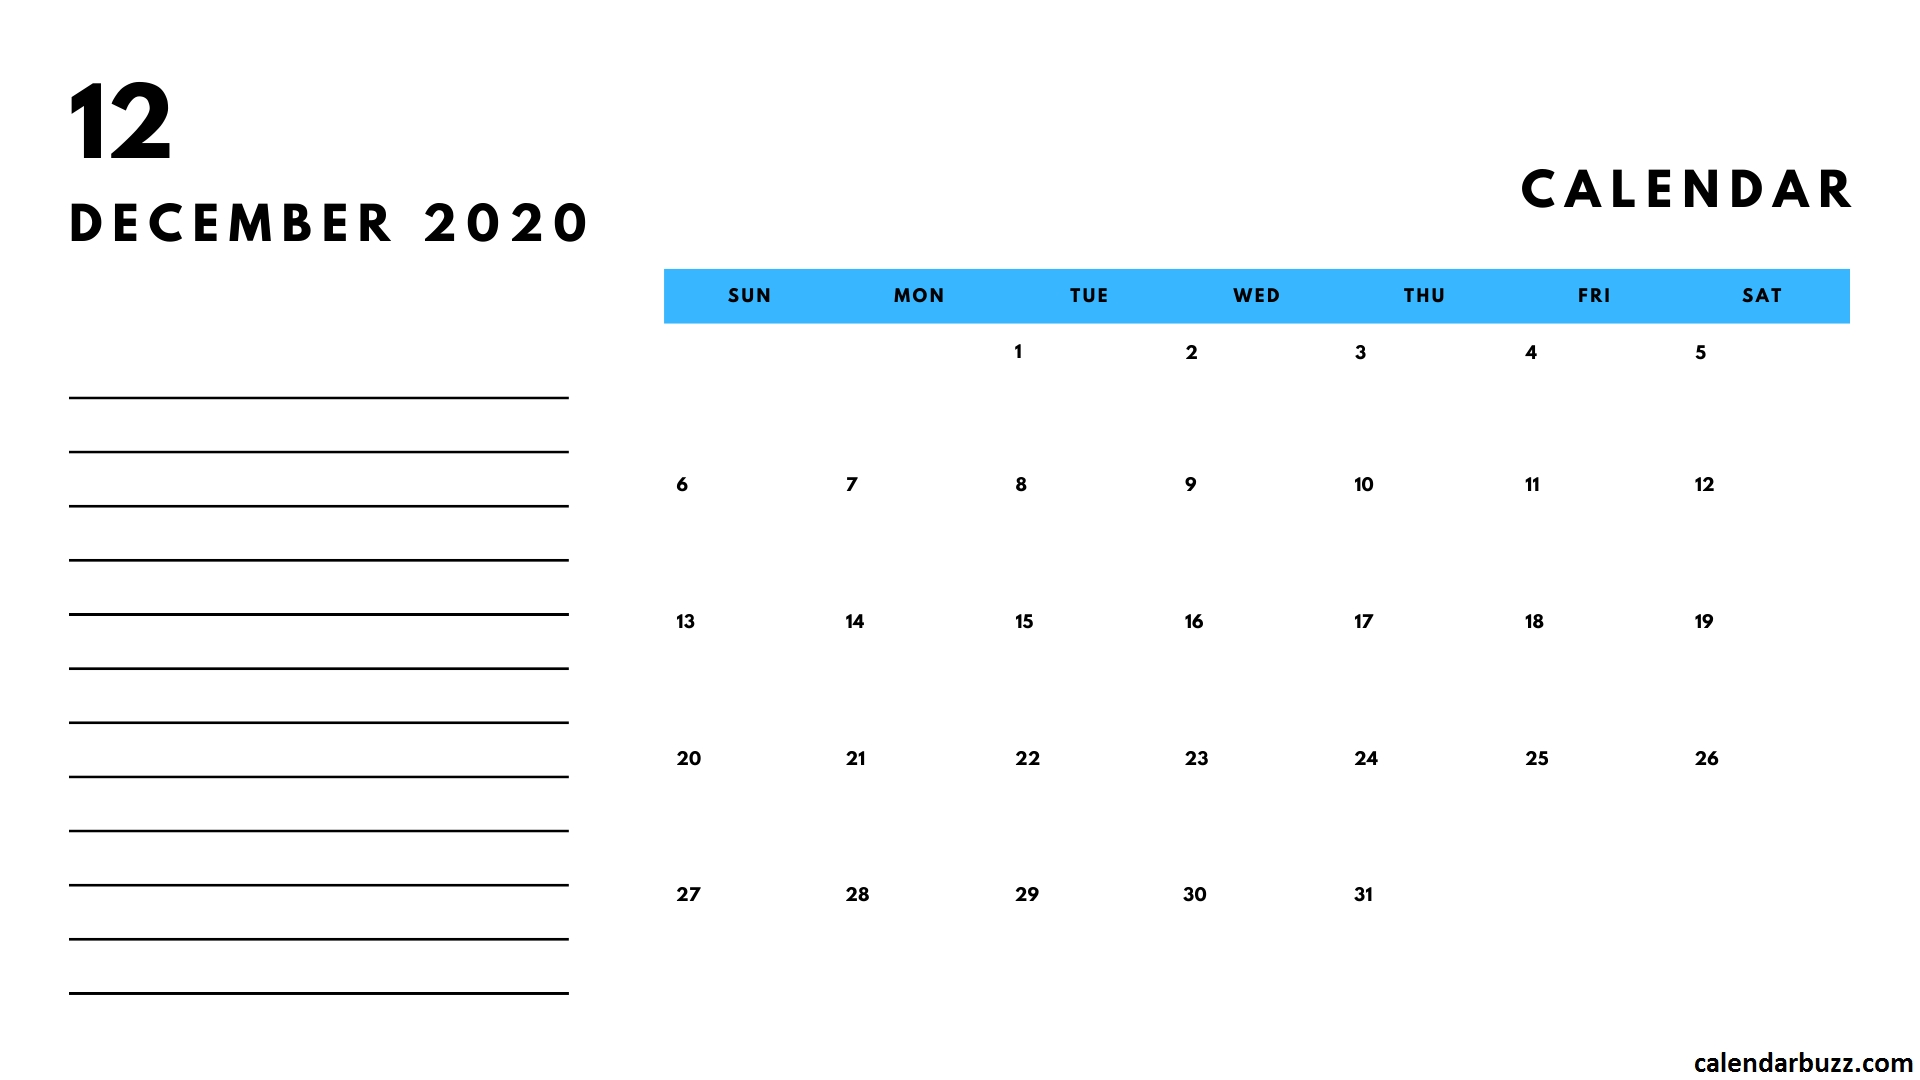 December 2020 Calendar With Notes   Calendar, Calendar